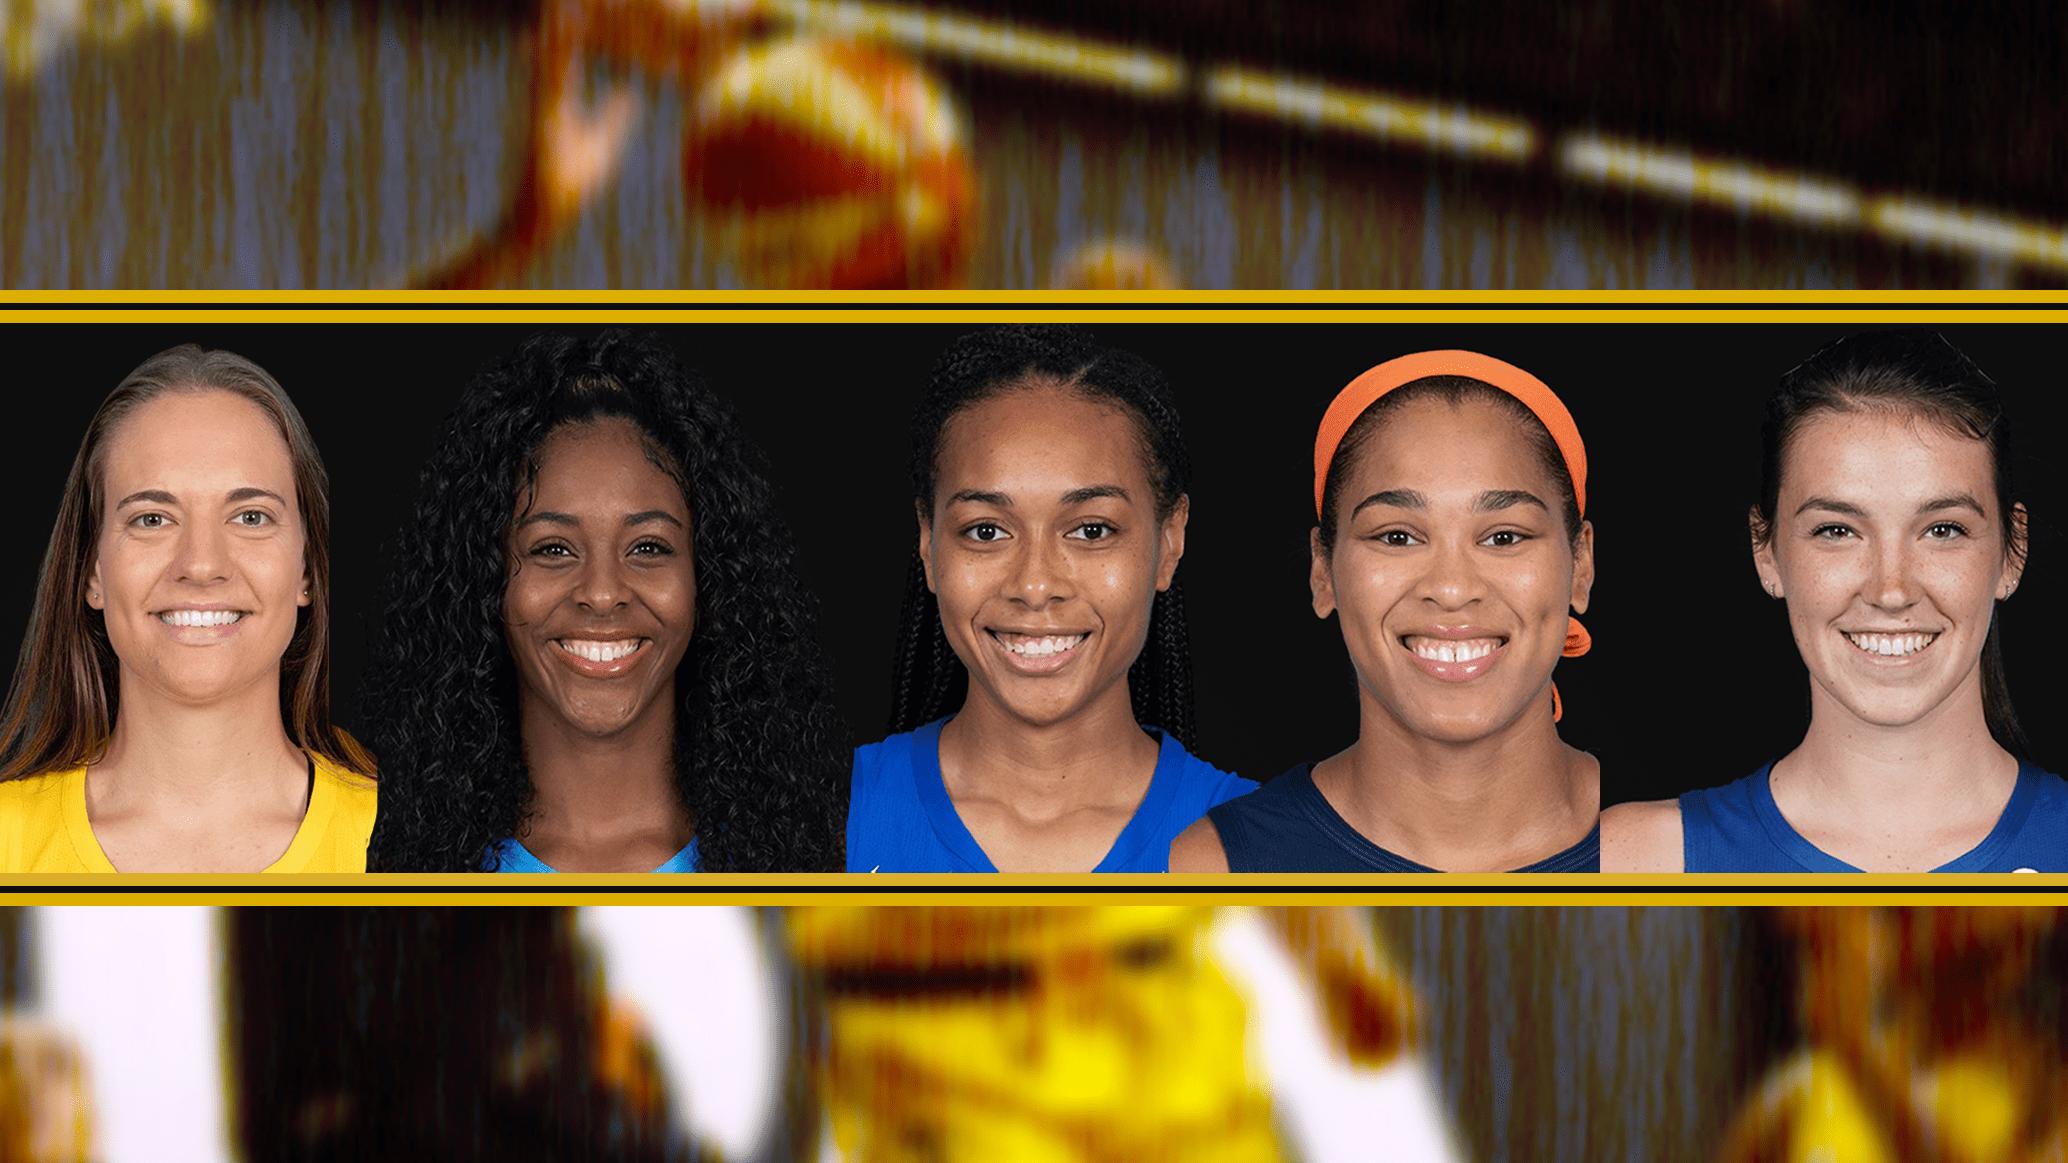 Cheyenne Parker, Sydney Wiese Lead WNBA's Most Underrated List